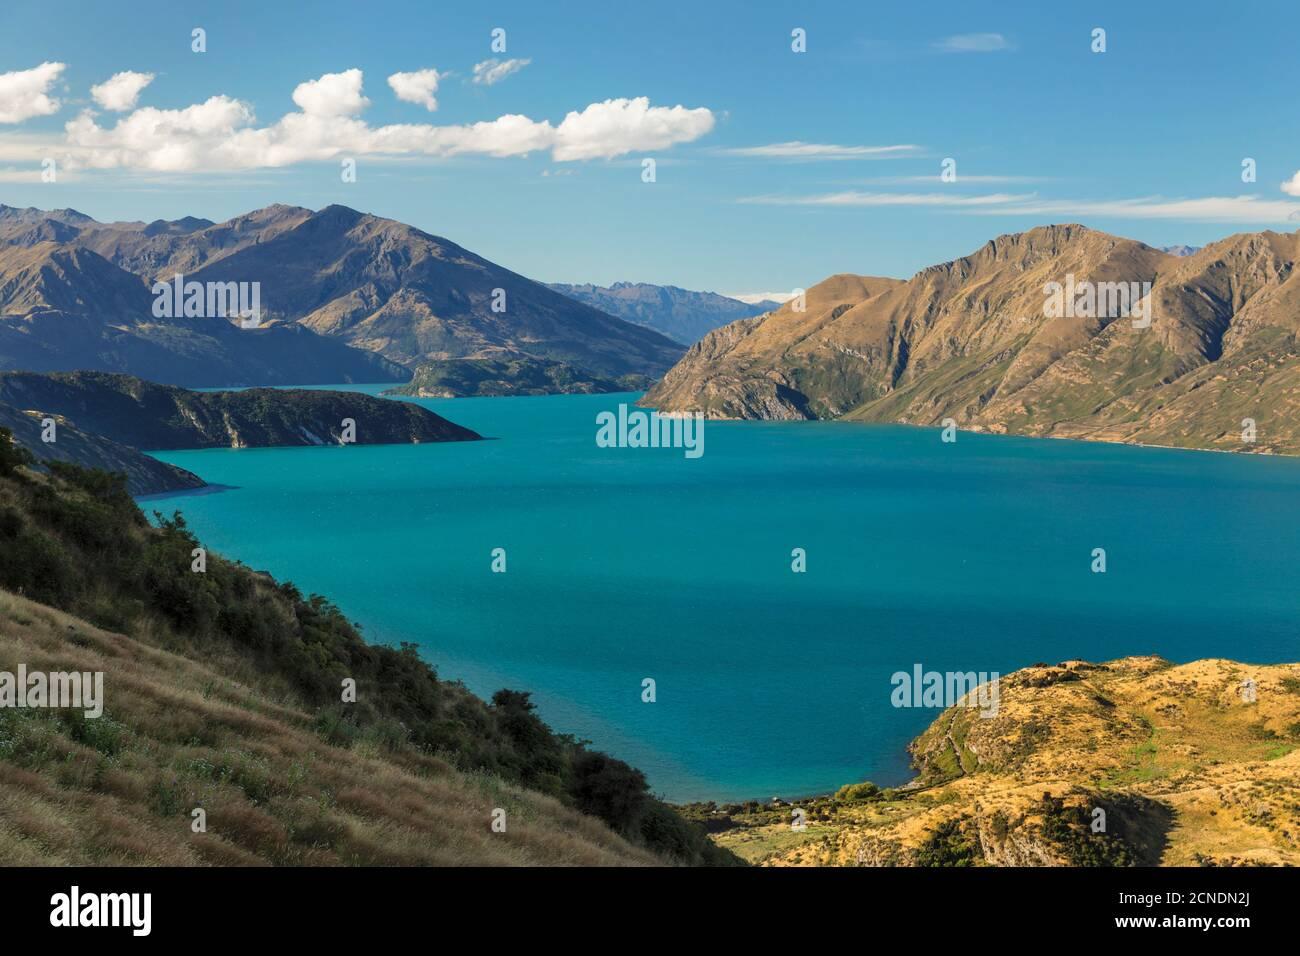 Lake Wanaka from Roy's Peak Track, Mount-Aspiring National Park, UNESCO World Heritage Natural Site, Otago, South Island, New Zealand, Pacific Stock Photo